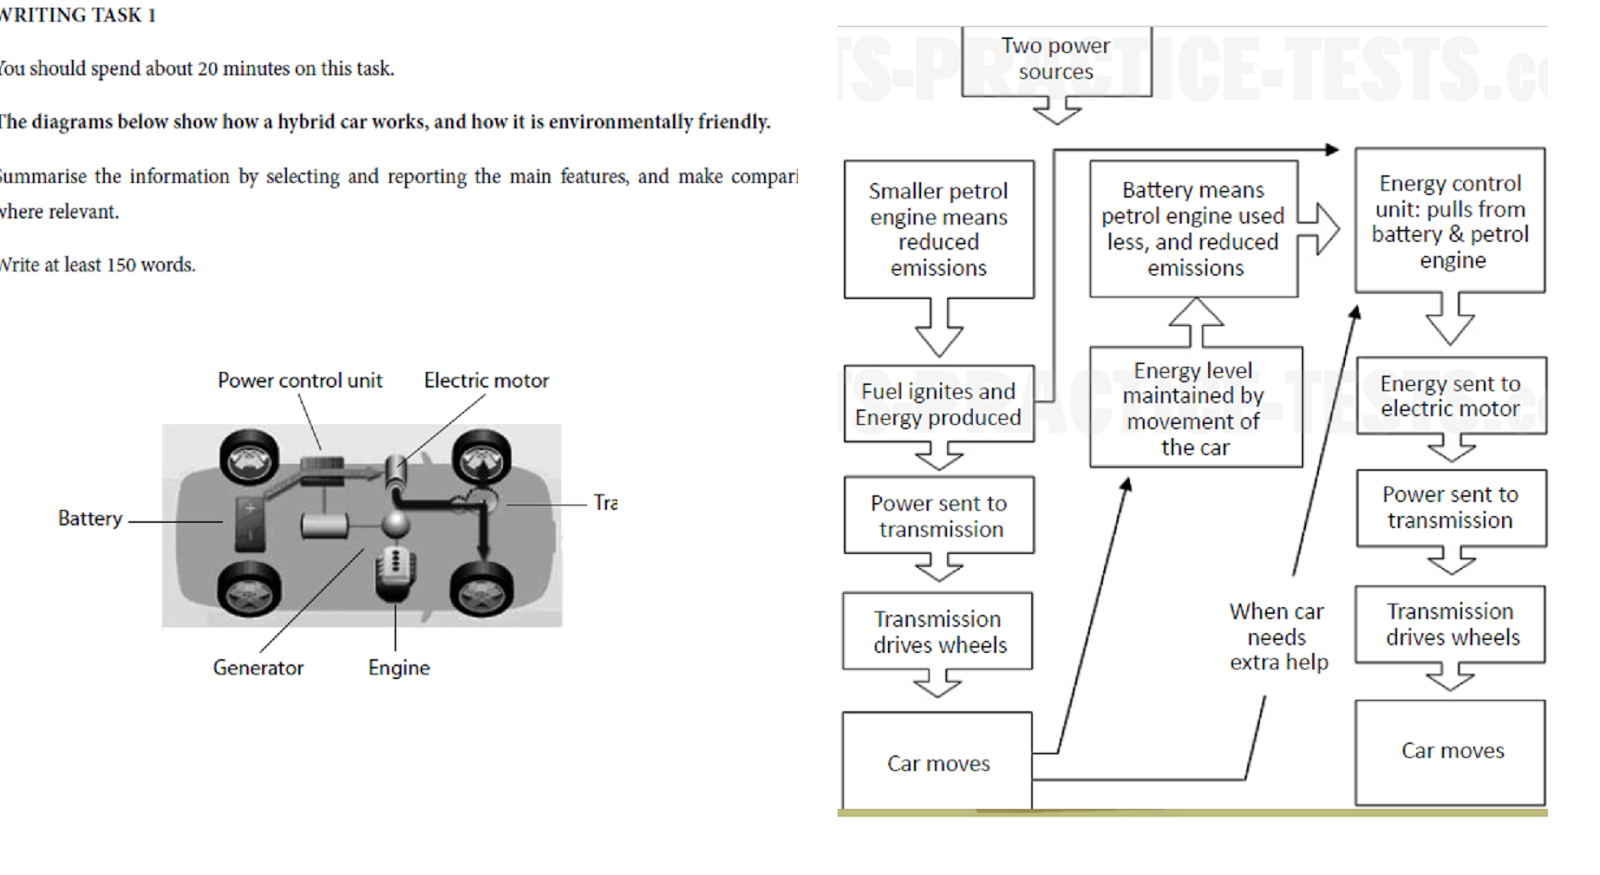 medium resolution of hybrid car flow chart ielts task 1 band 7